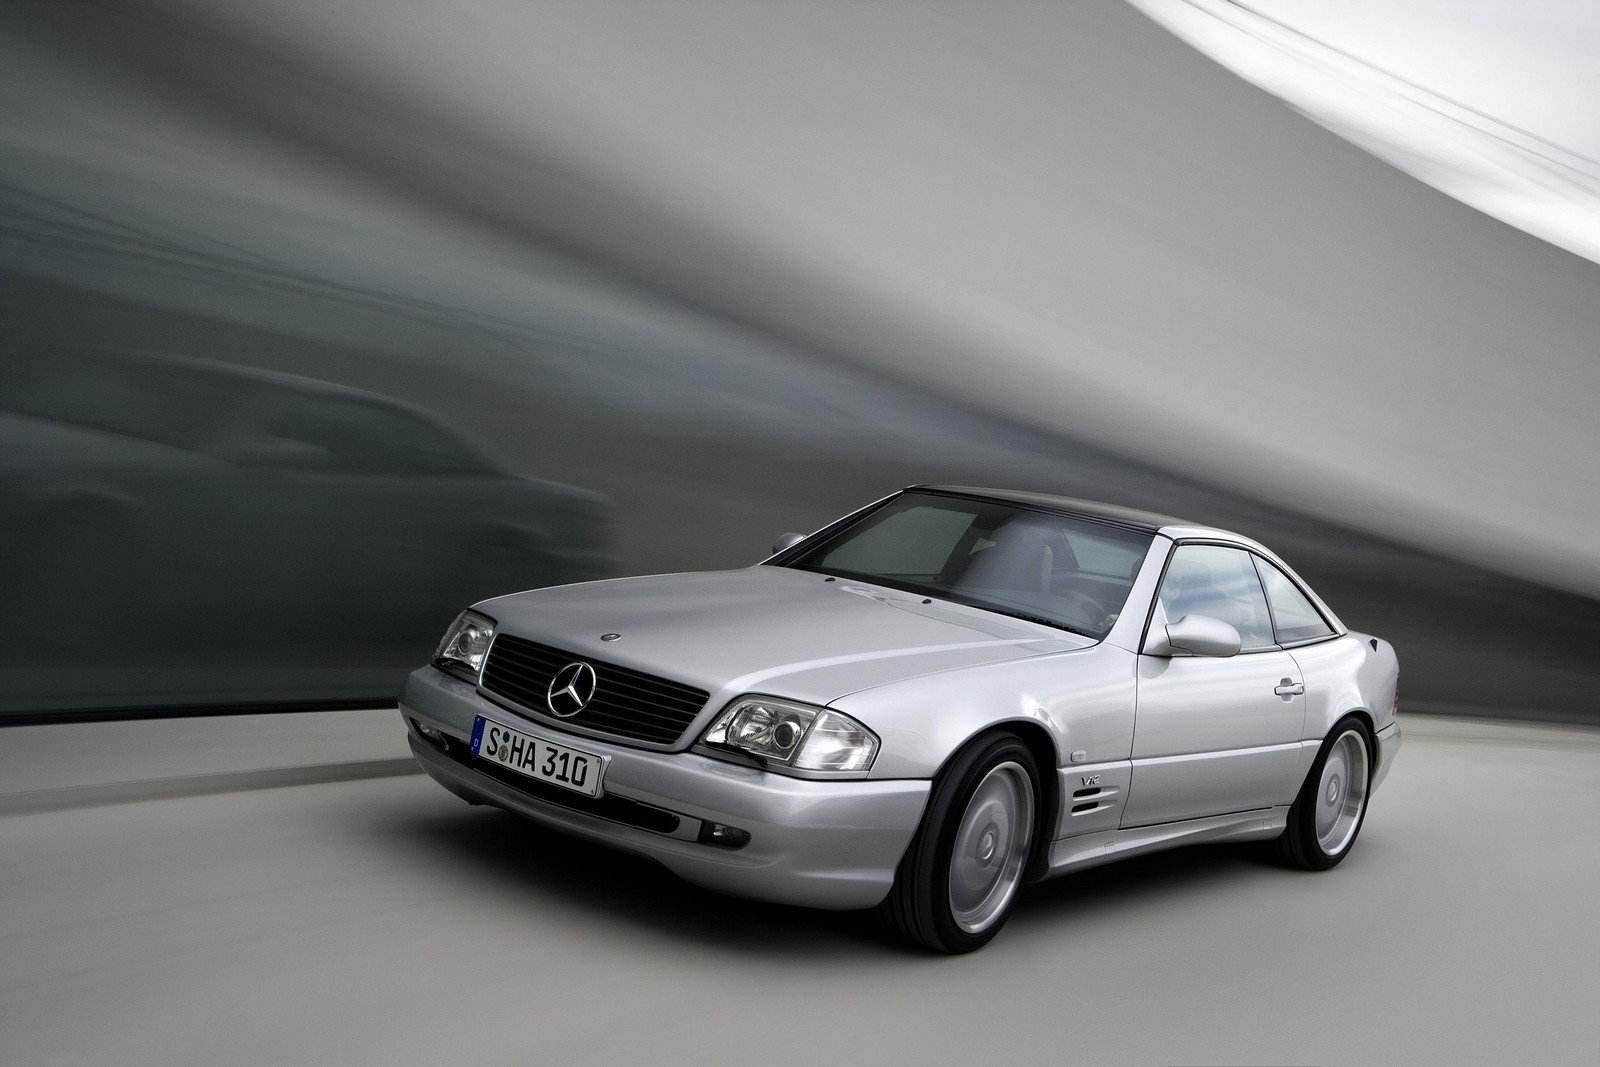 Mercedes-Benz SL73 AMG - 1999